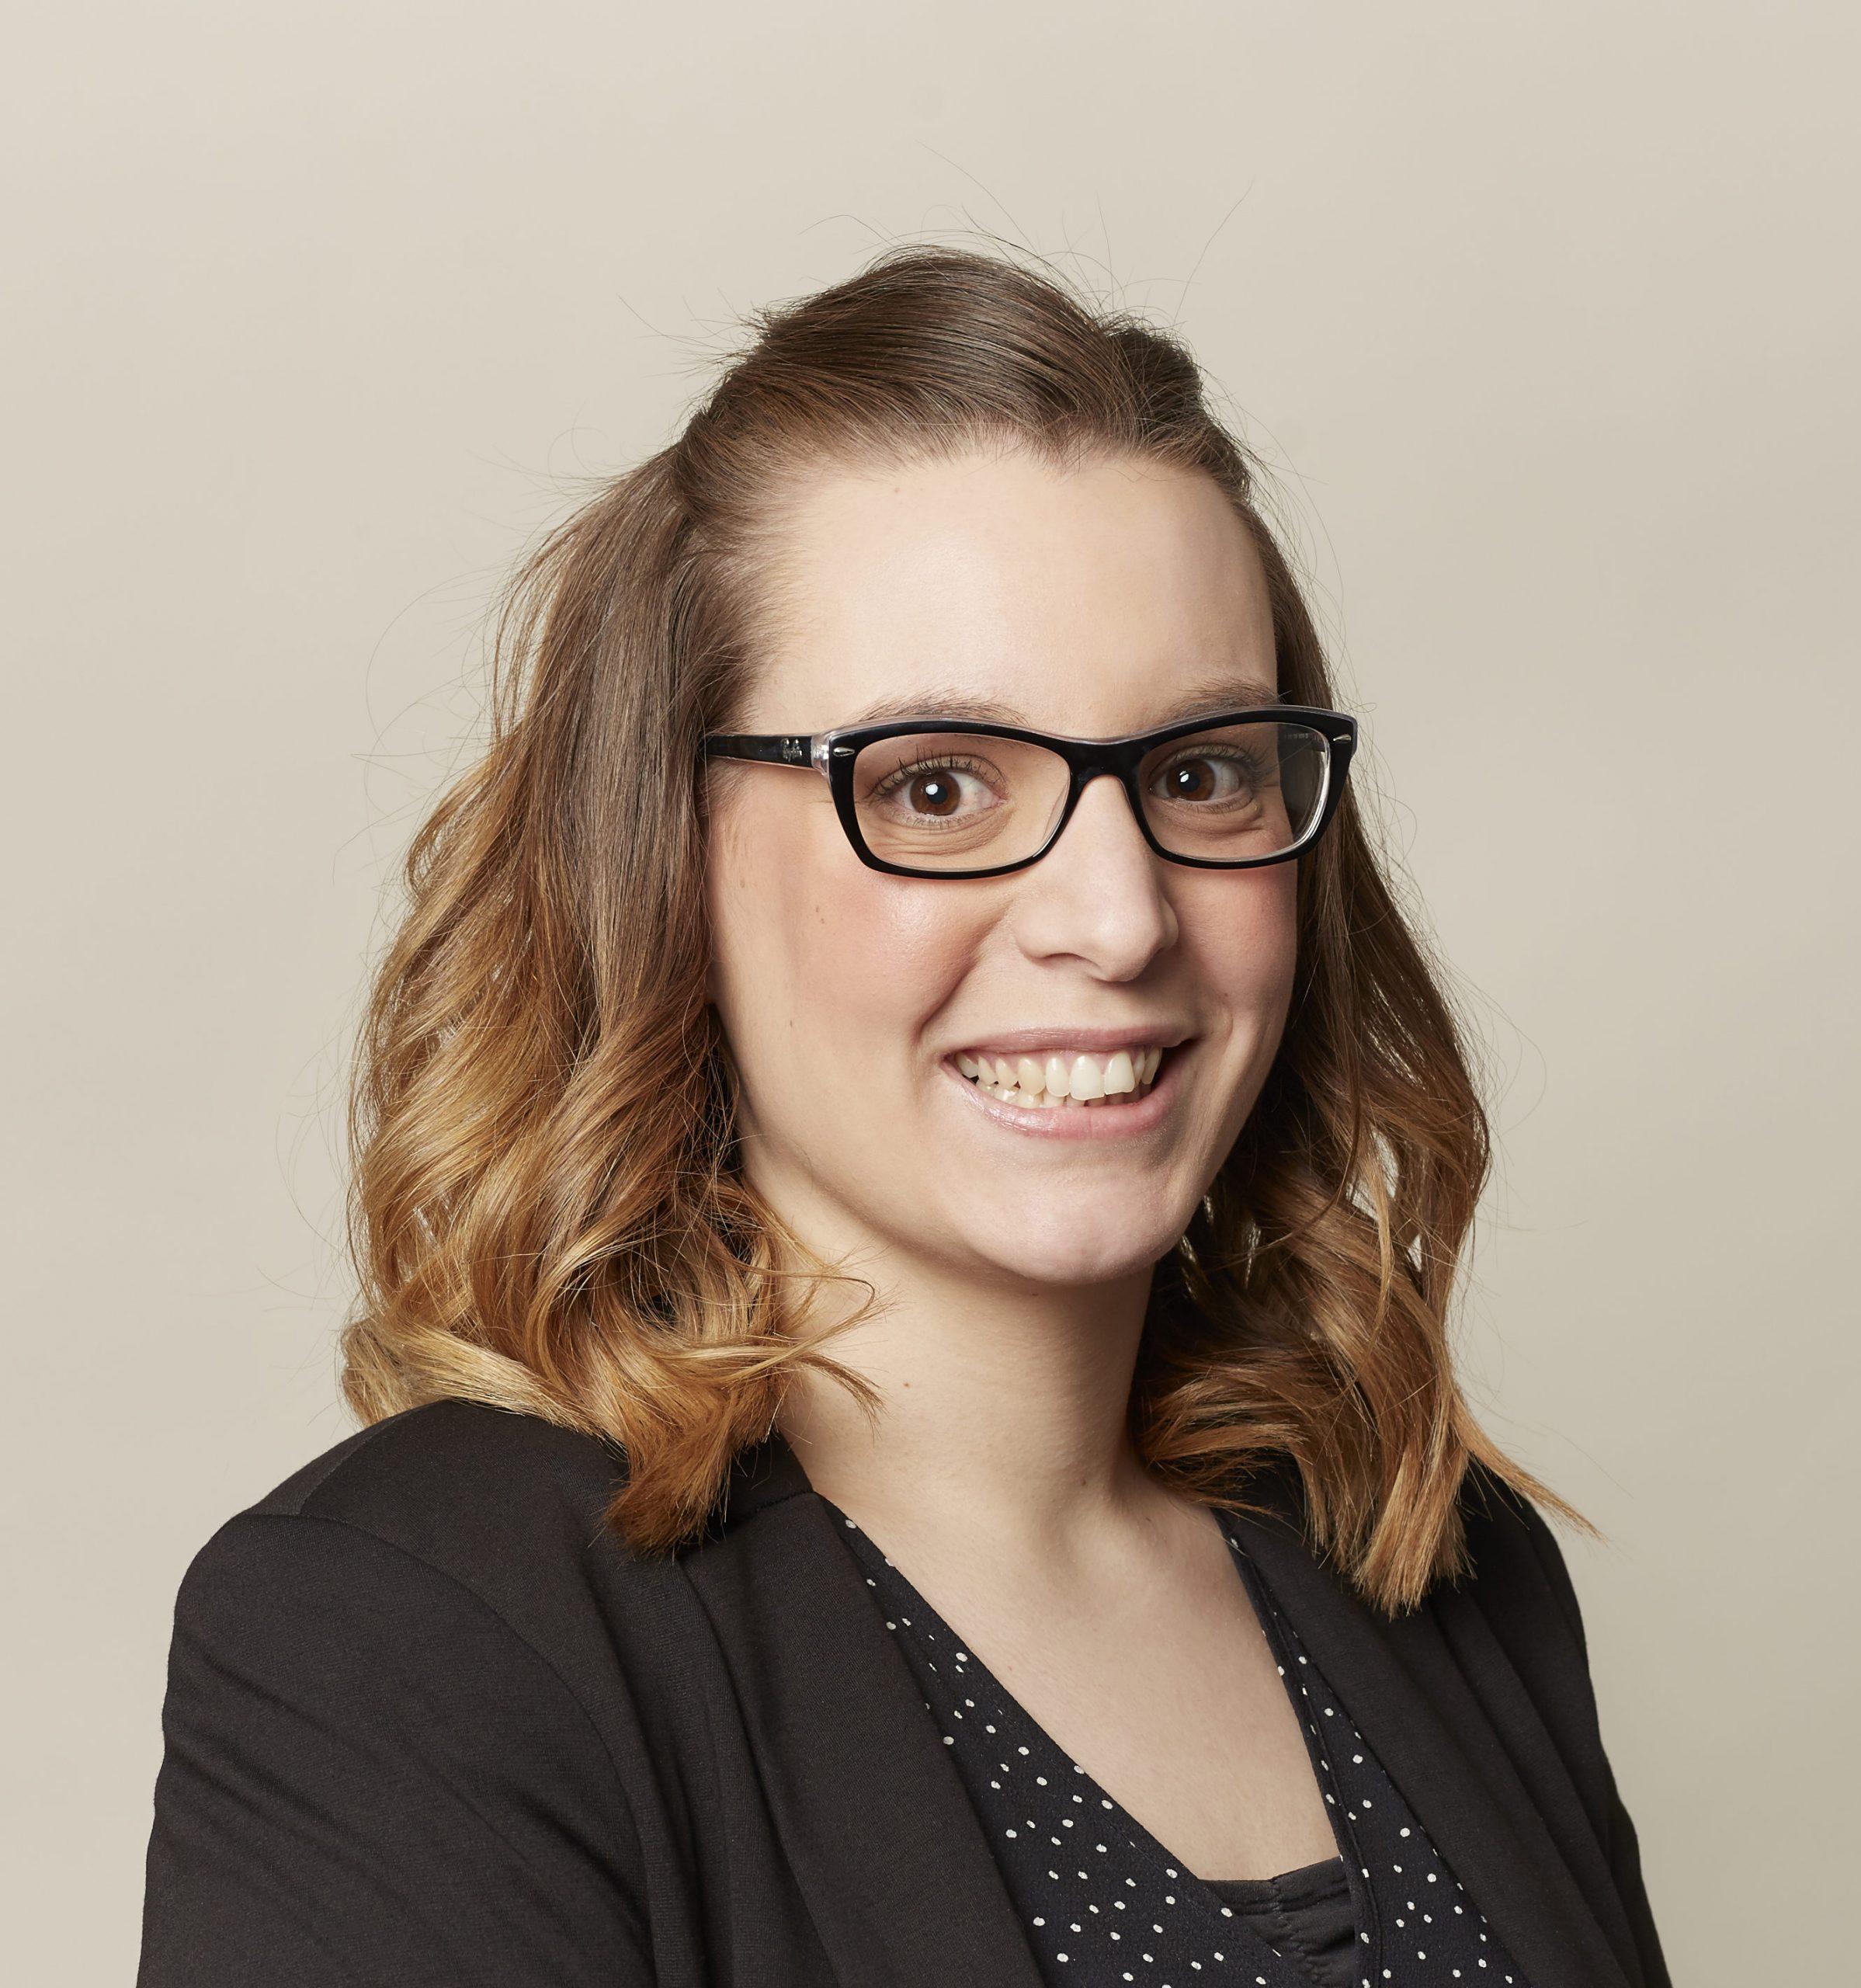 Hannah Dempsey (Maternity leave) image